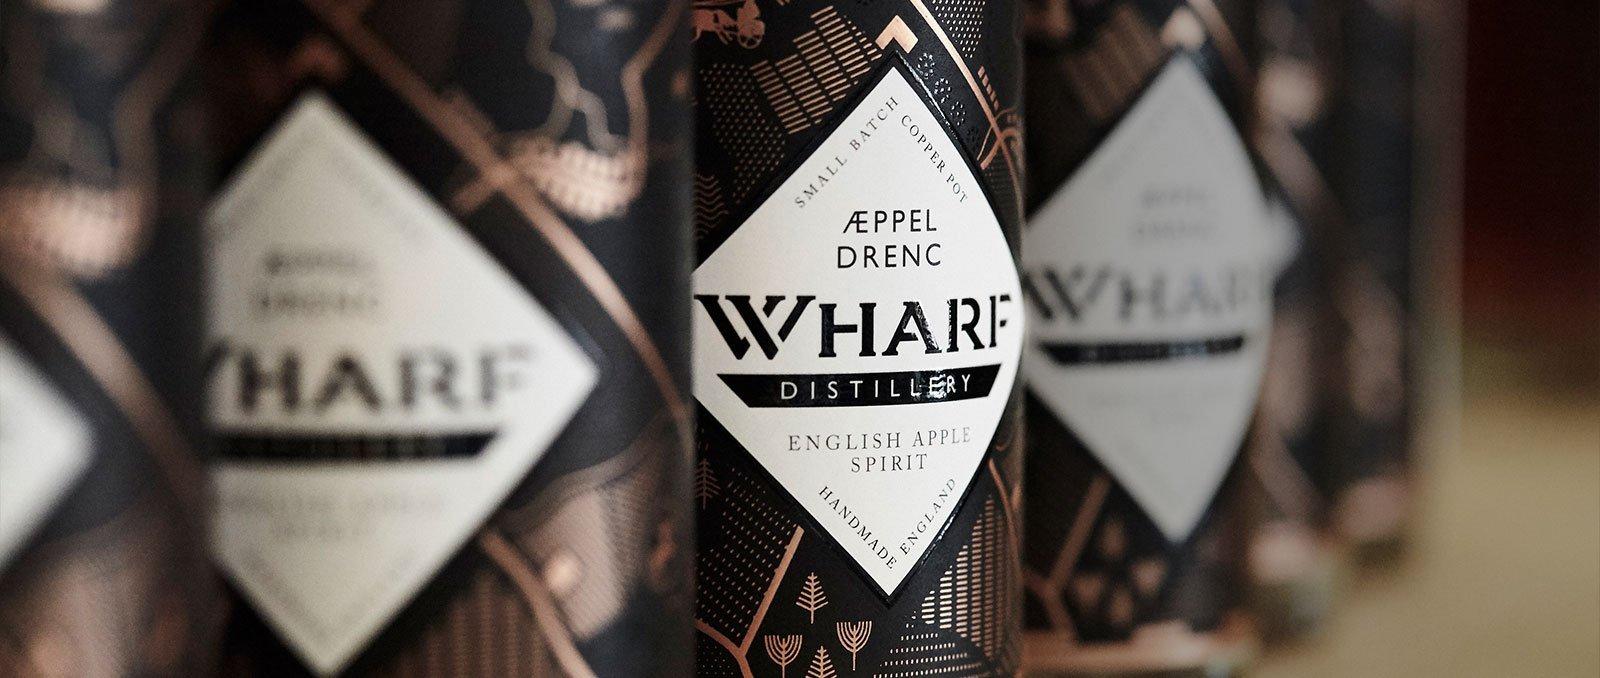 wharf-distillery-home-hero-2